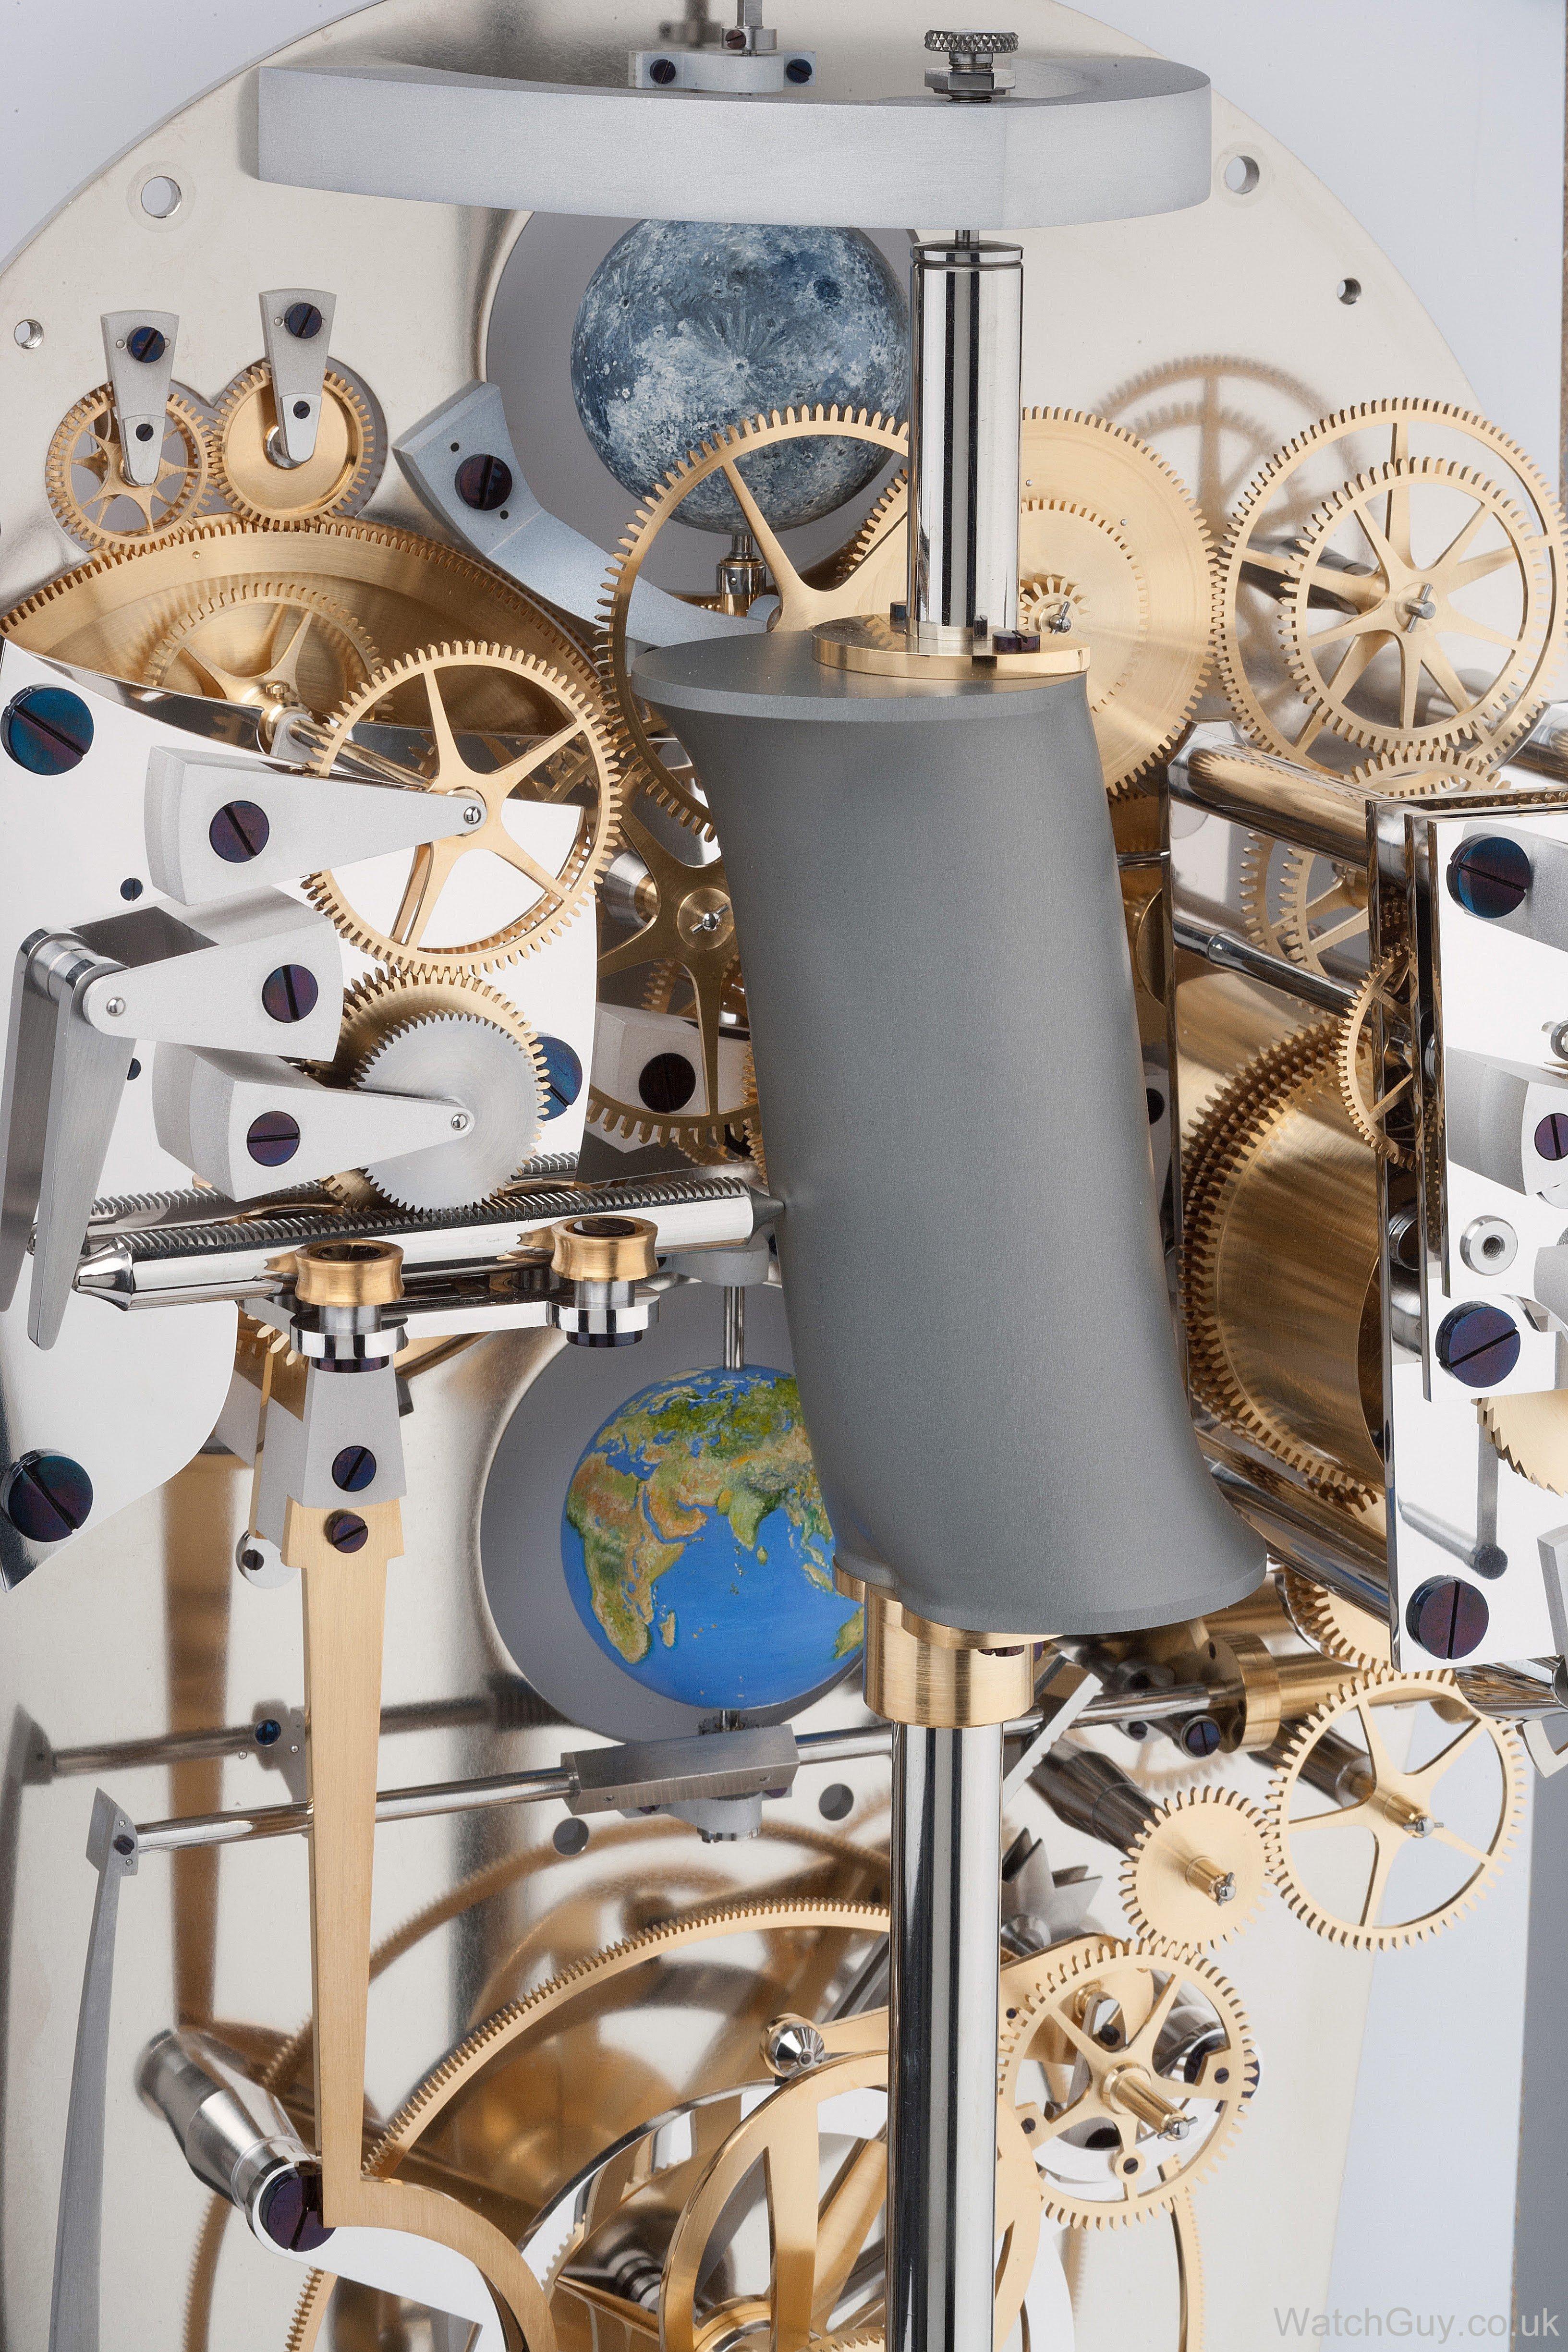 The de Fossard Solar Time Clock | Watch Guy